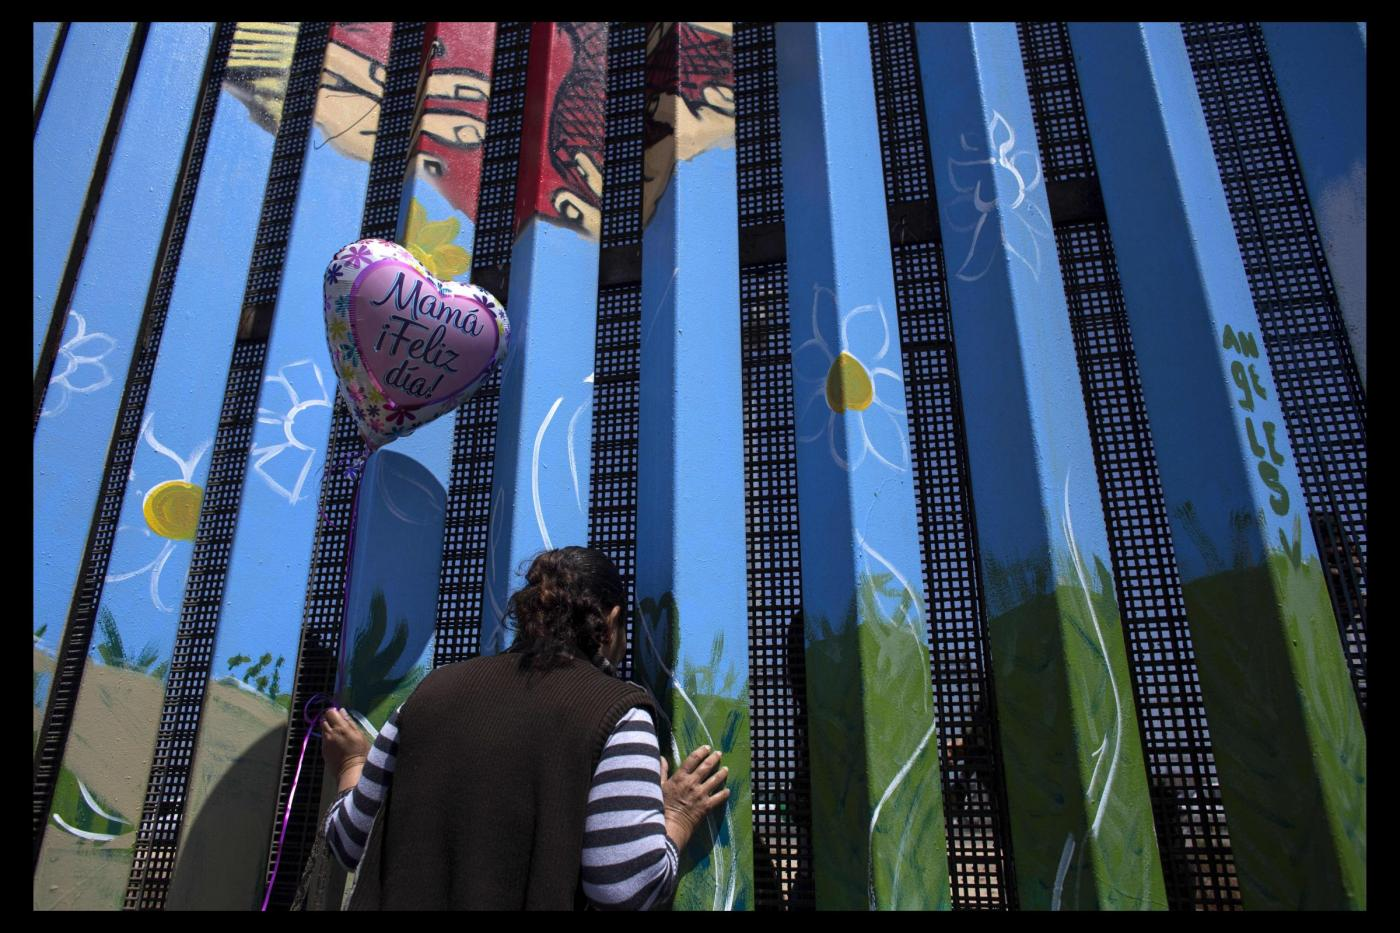 Mother's Day Reunion At Mexico Border Portfolio LaPresse